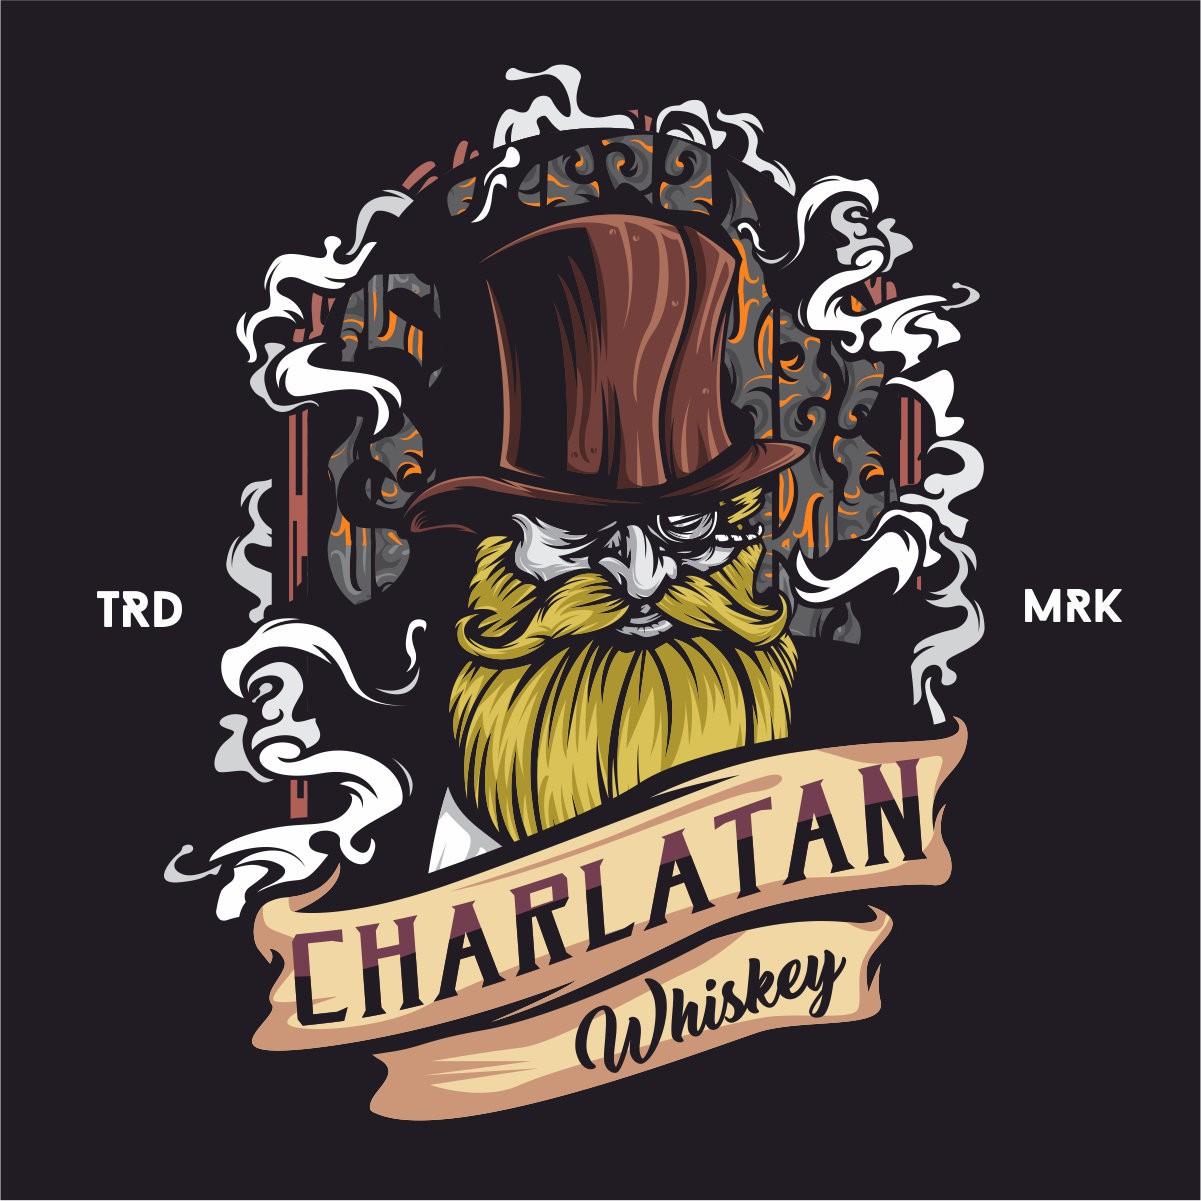 Charatan Cartoon Man